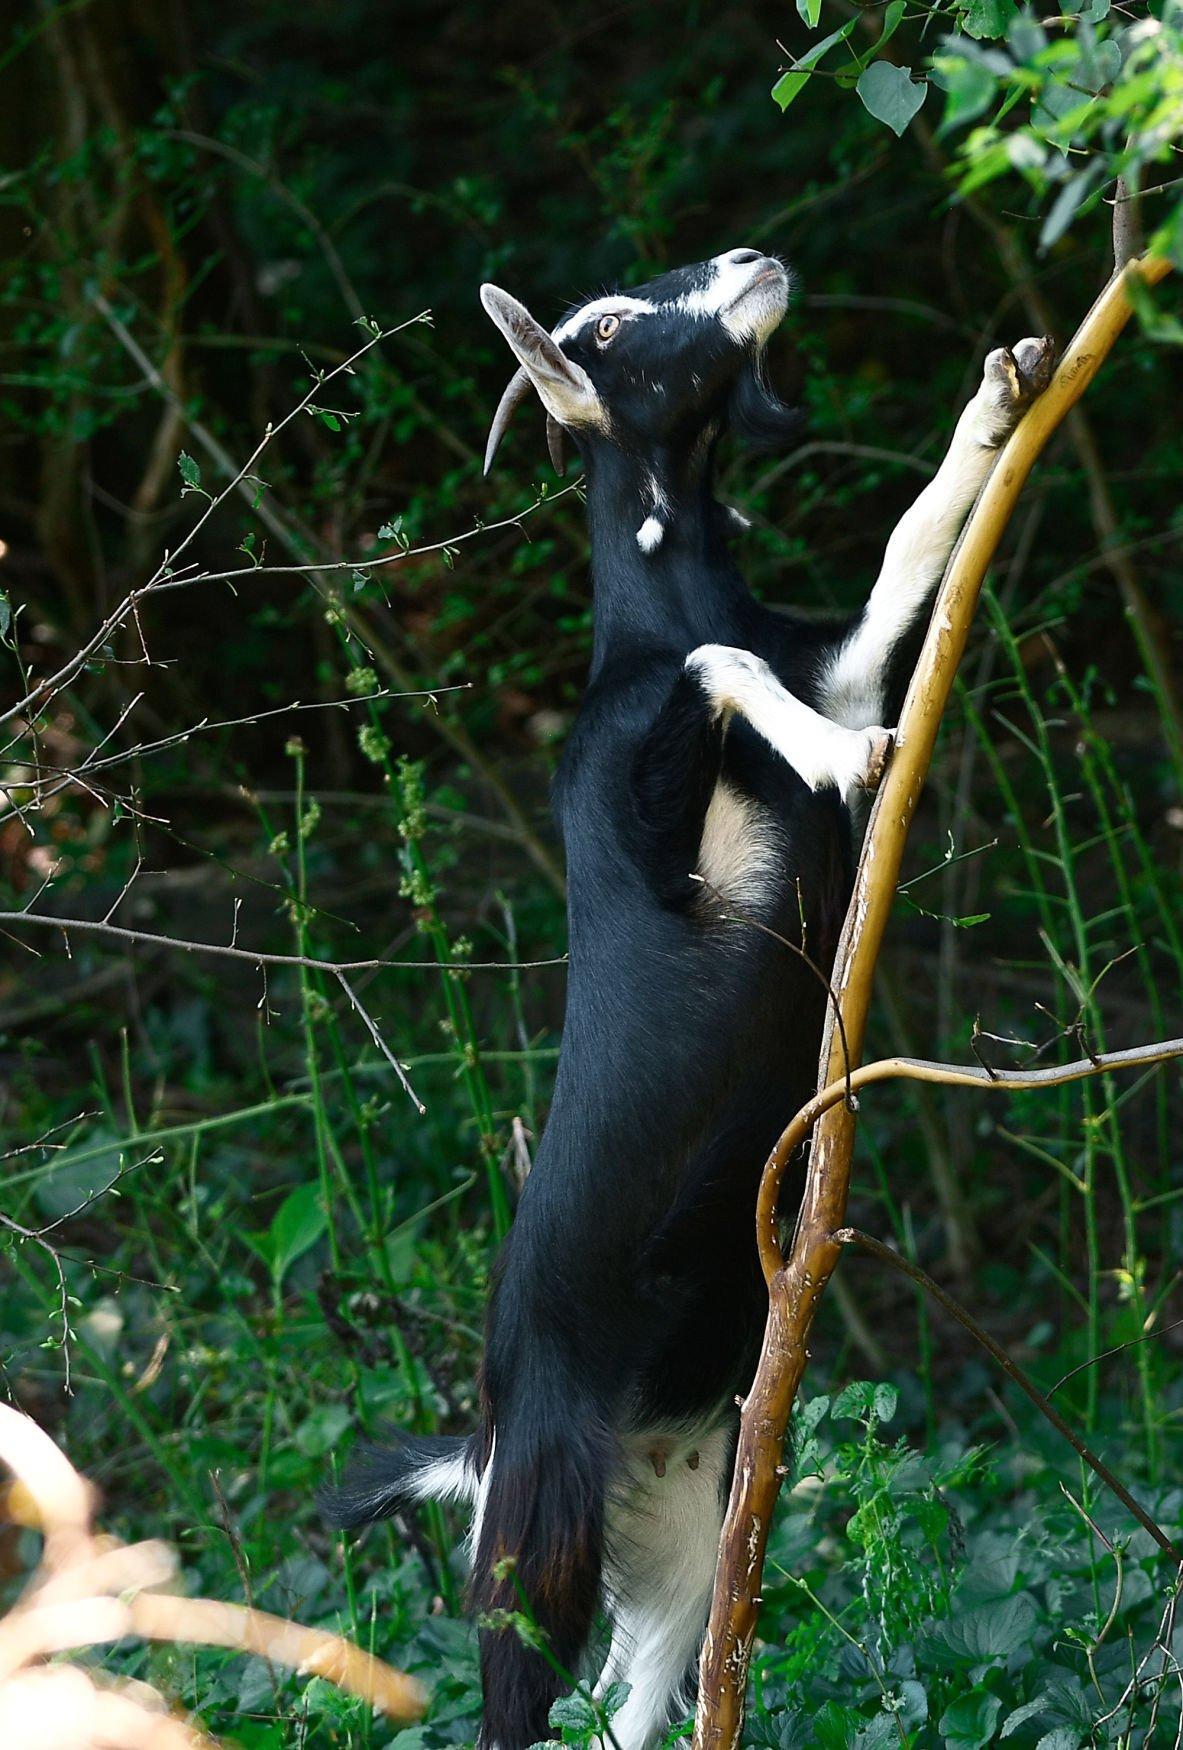 Nigerian Dwarf goat climbs in Maryville College Woods